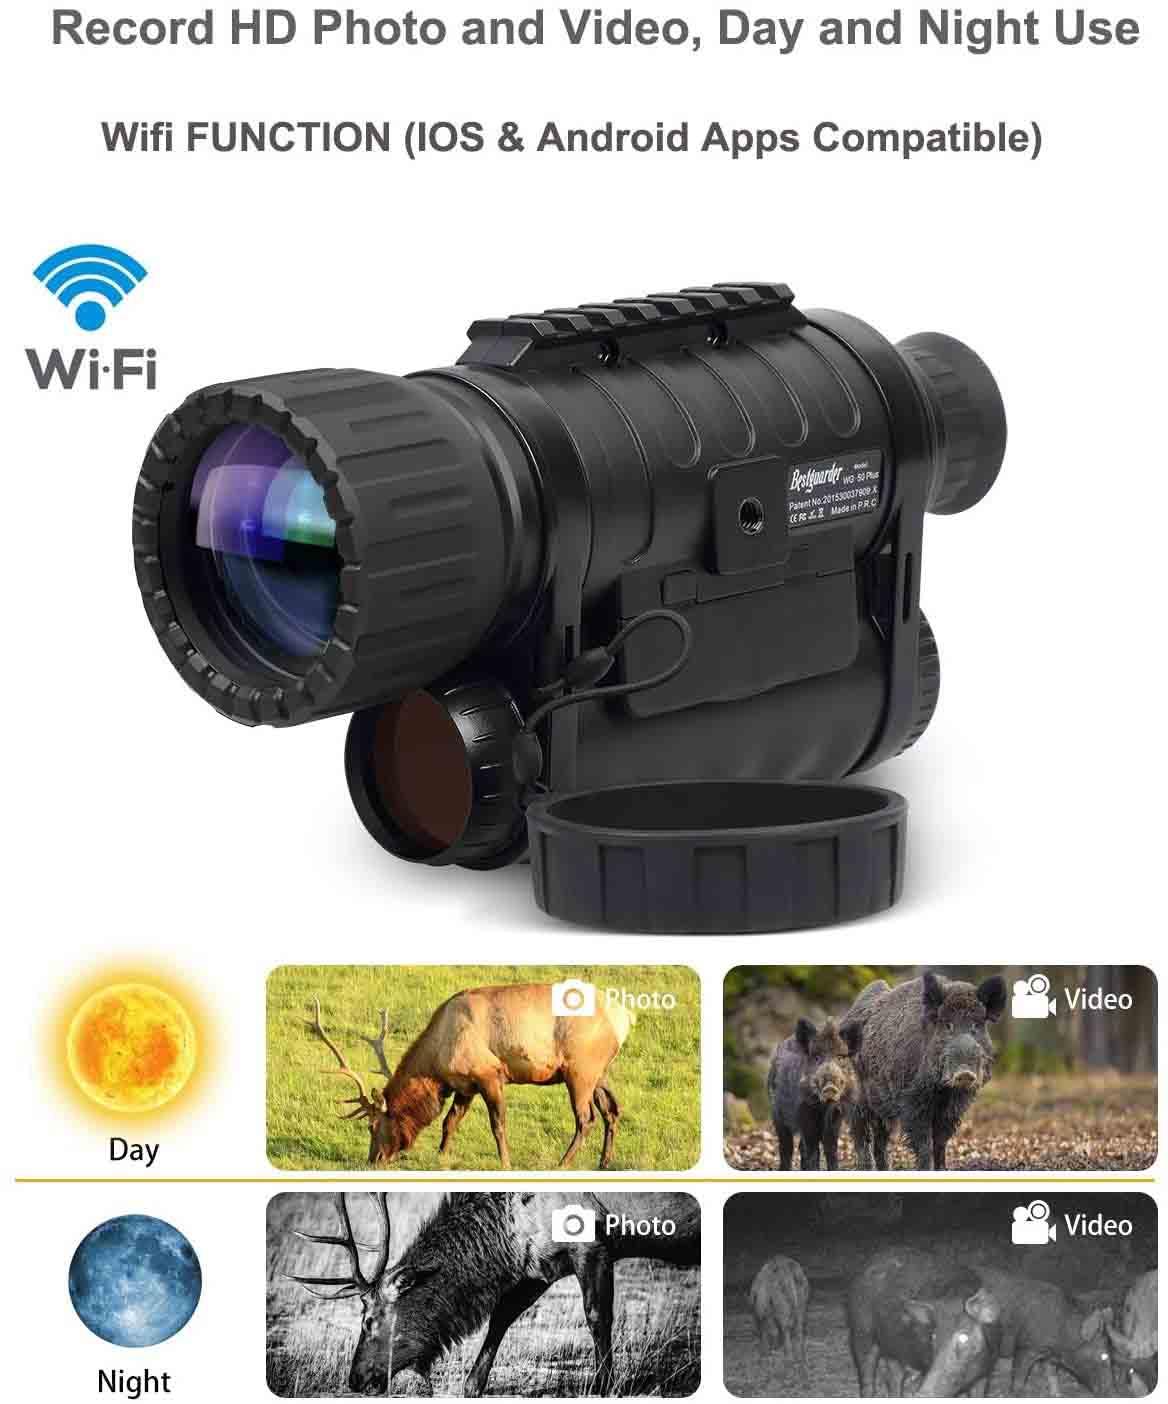 bestguarder WG-50 PLUS night vision pic